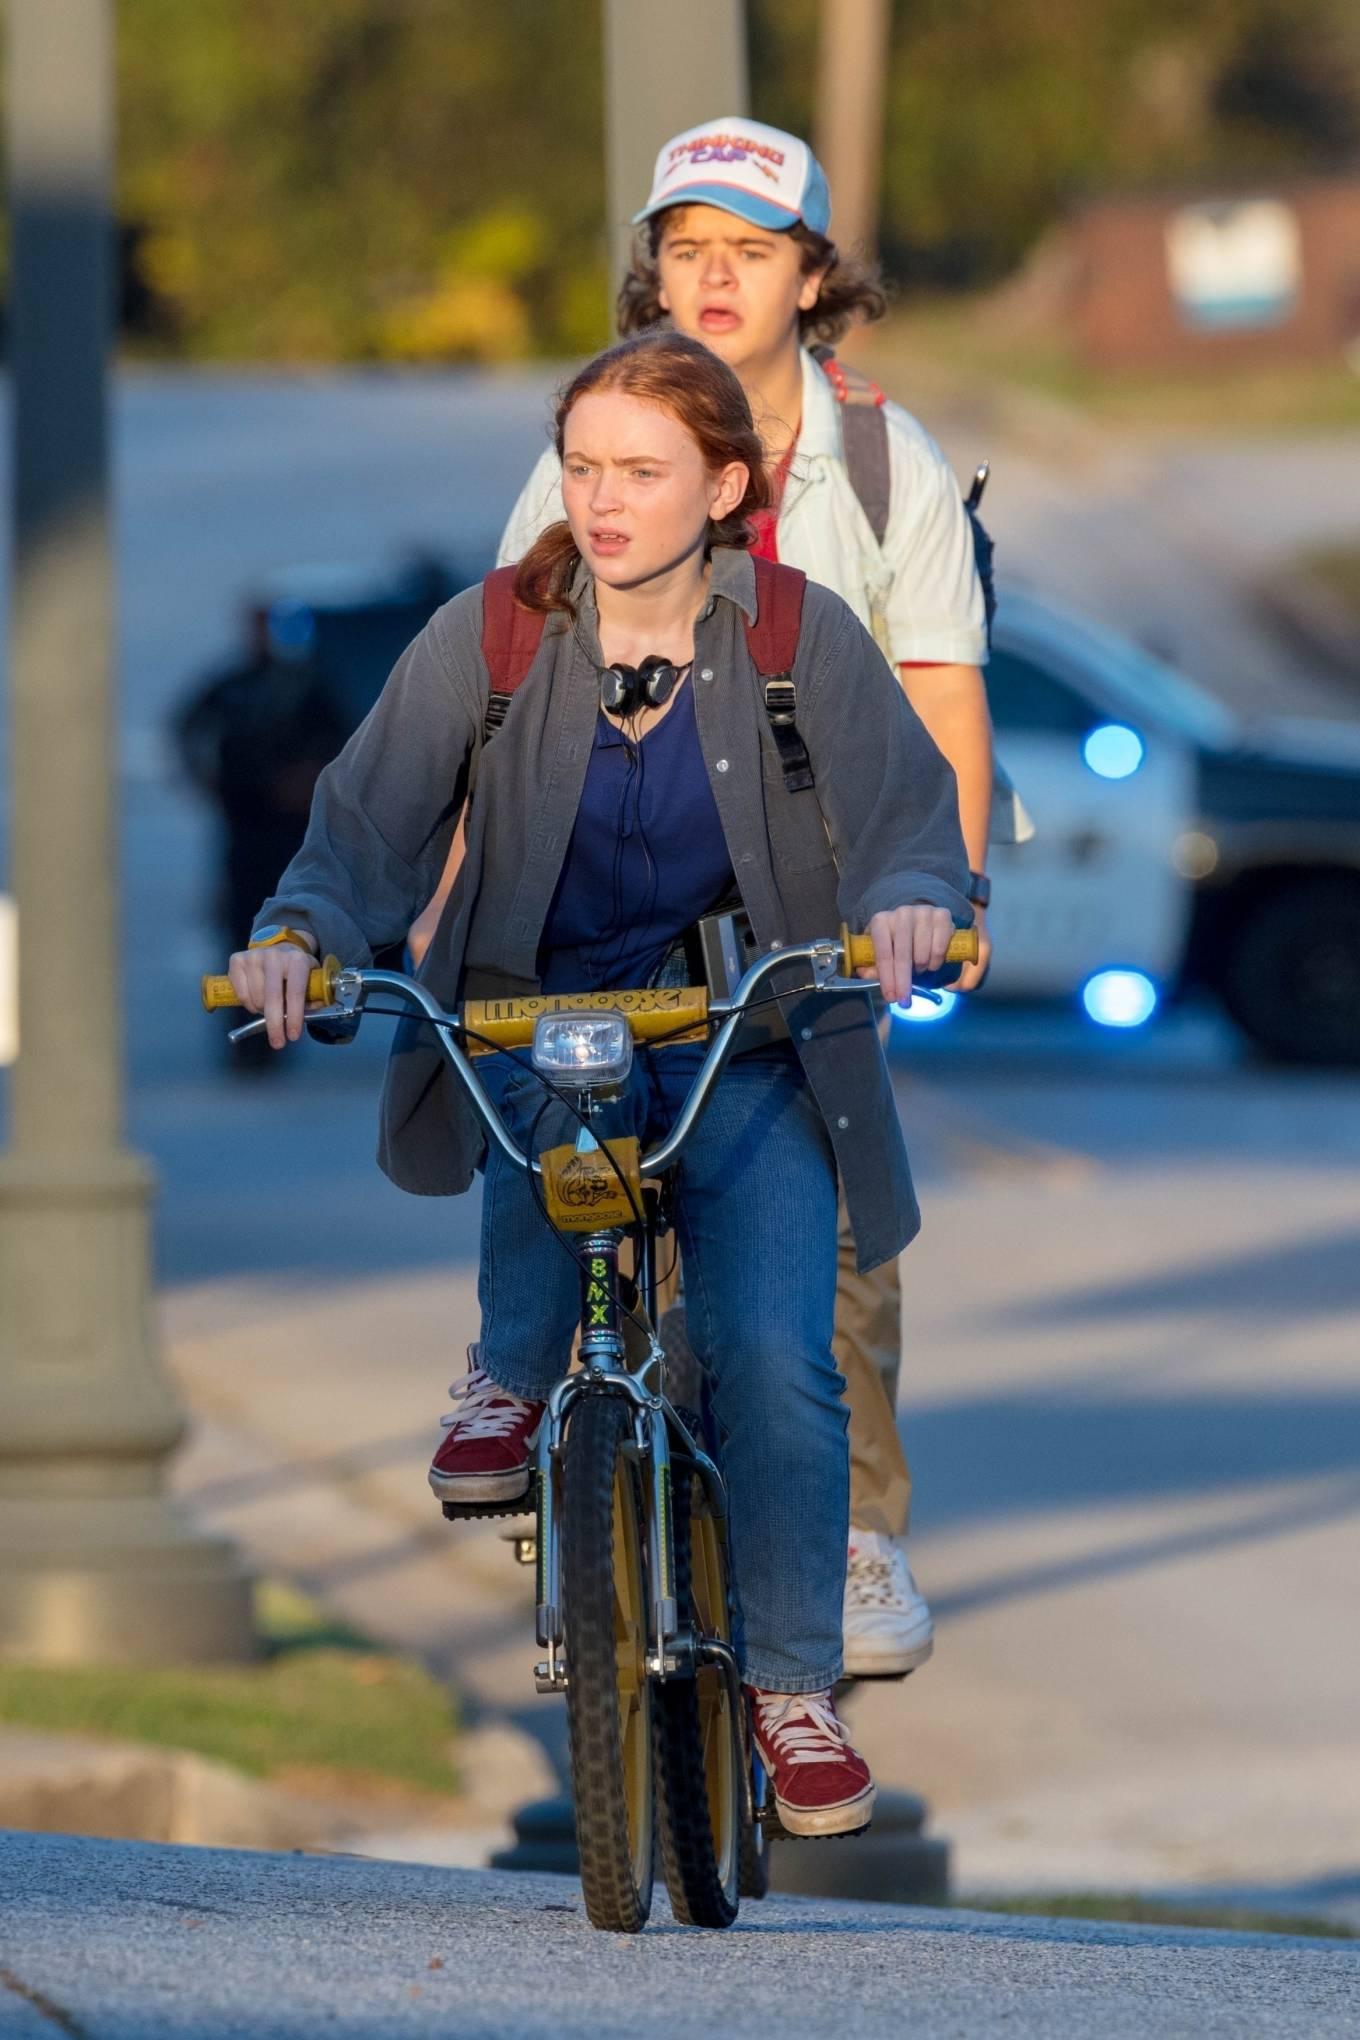 Sadie Sink 2020 : Gaten Matarazzo and Sadie Sink – Golden hour scene for Stranger Things Season 4 in Atlanta-03